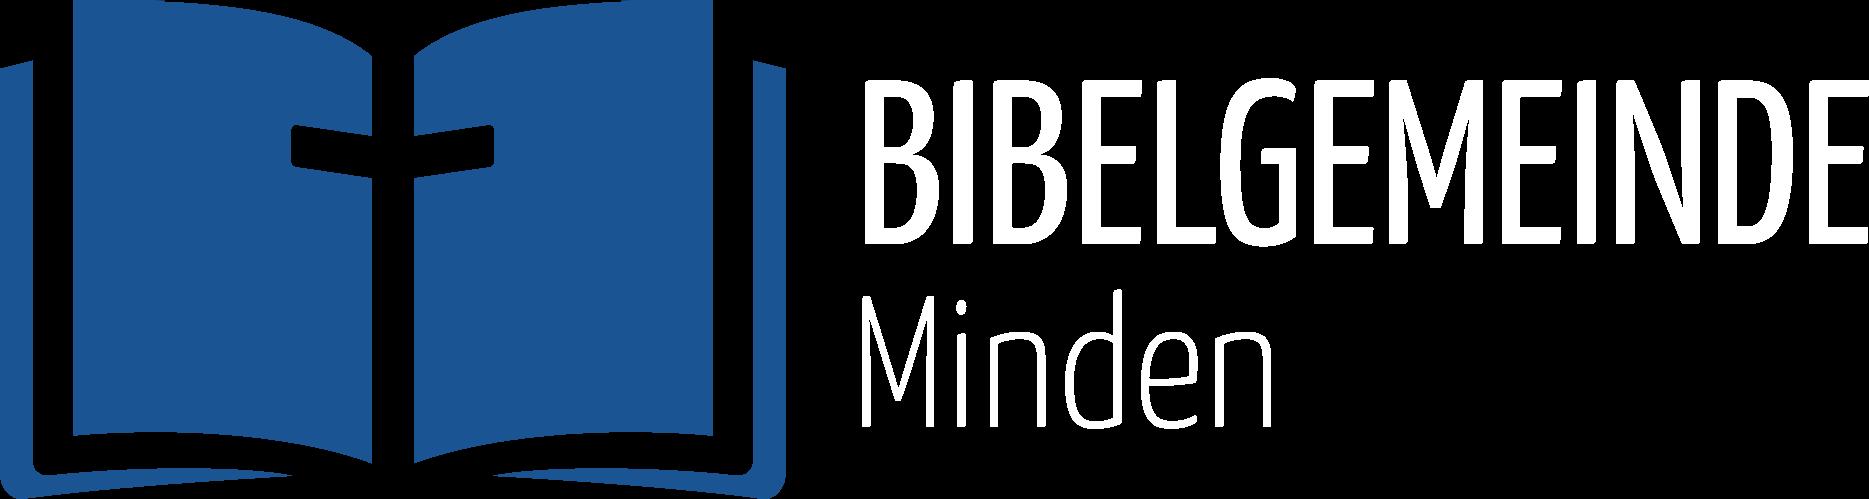 Bibelgemeinde Minden